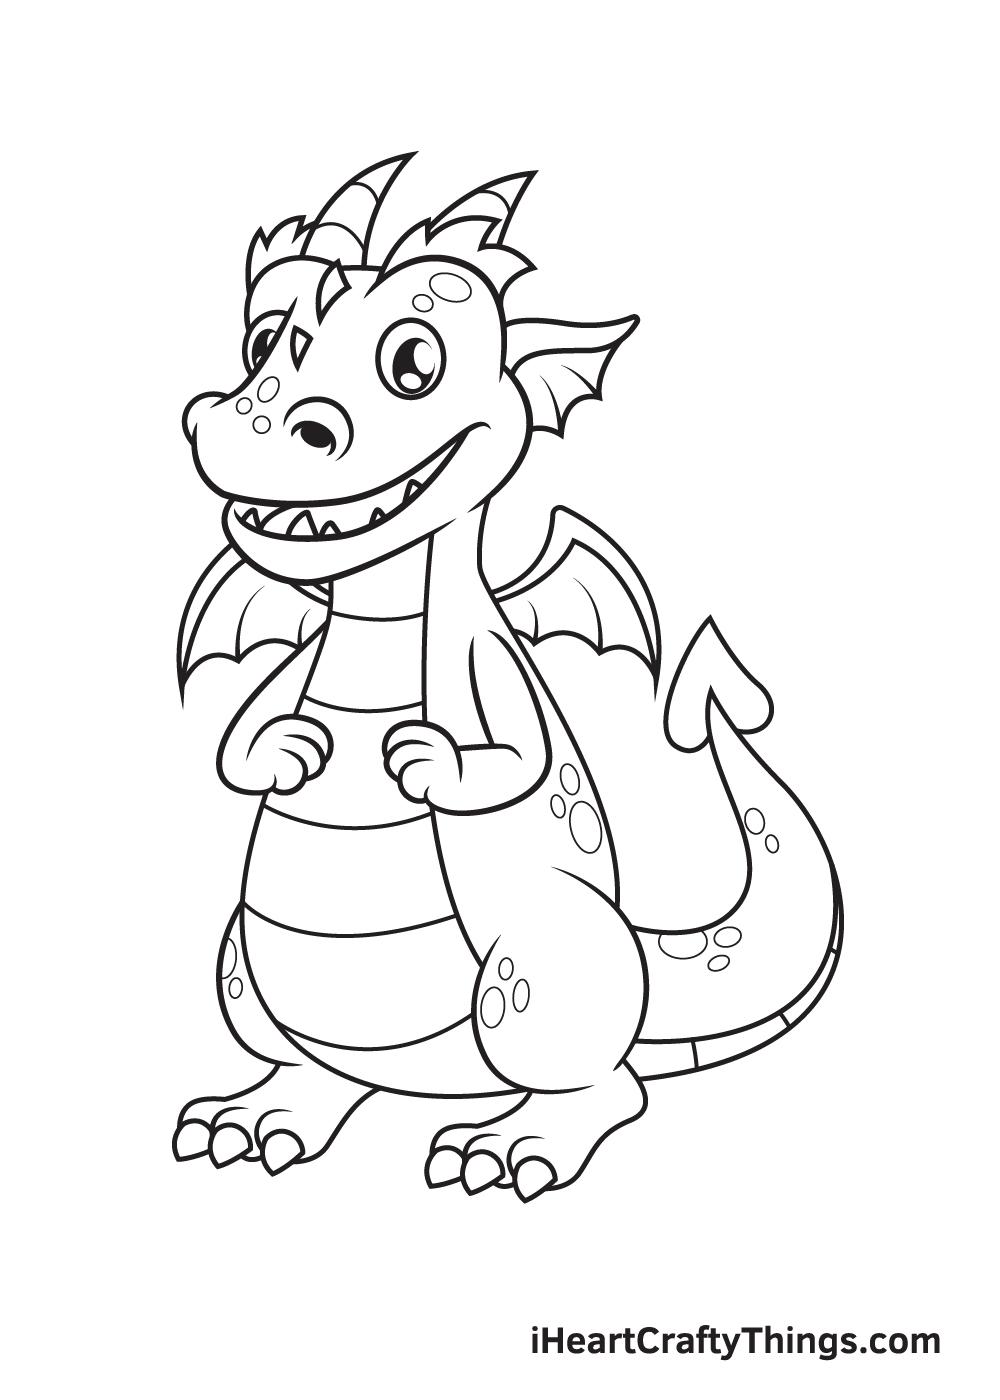 Dragon Drawing – Step 9